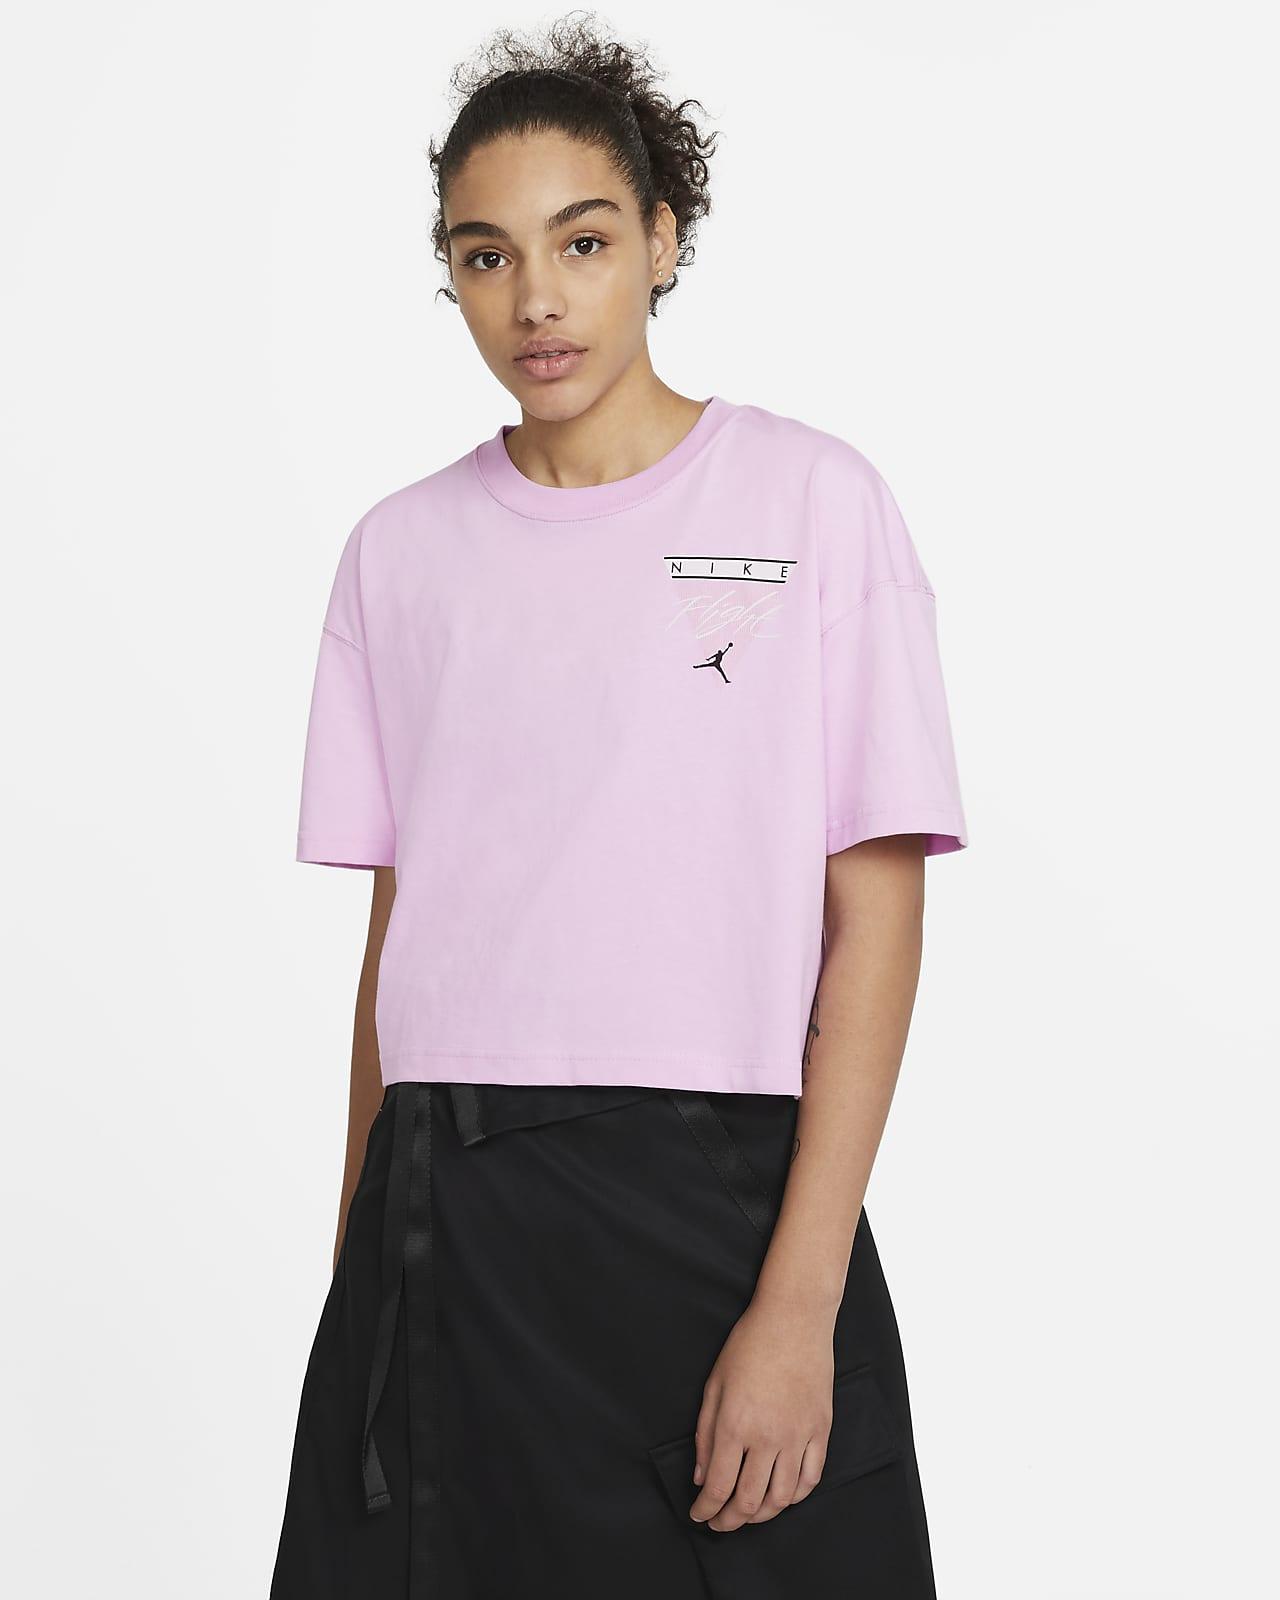 Jordan Essentials 女款圖樣 T 恤